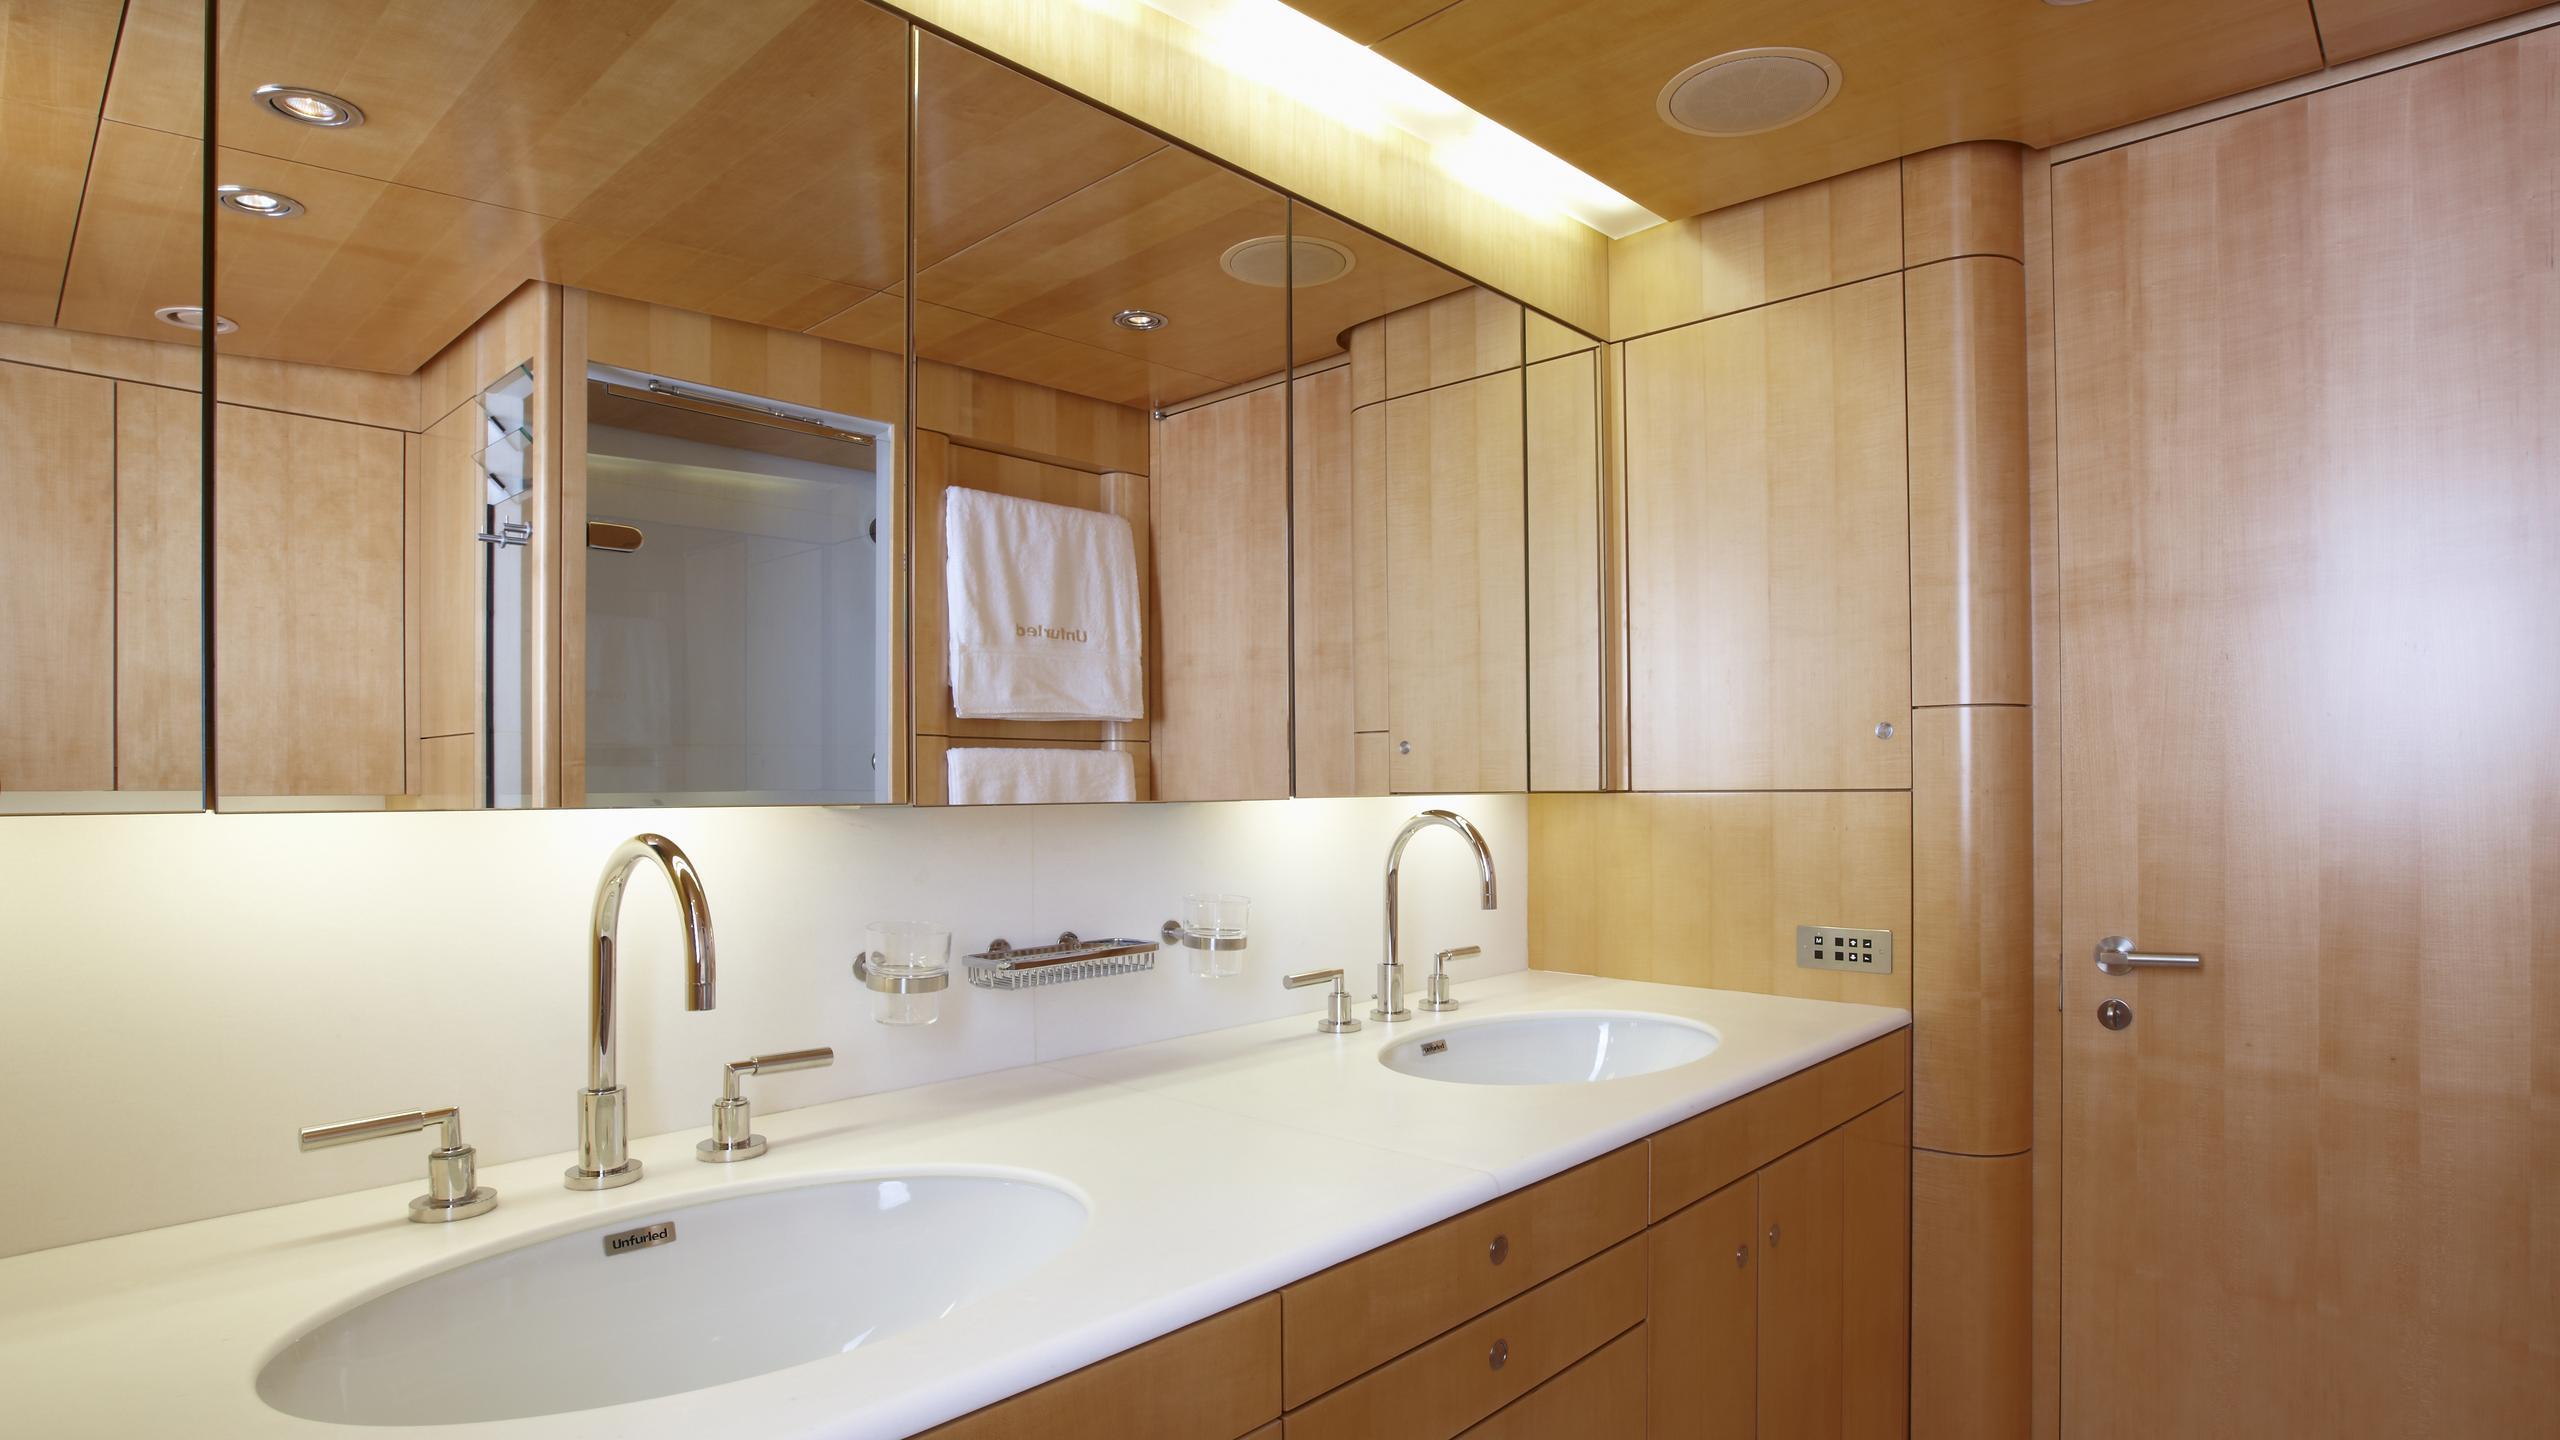 unfurled-yacht-master-bathroom